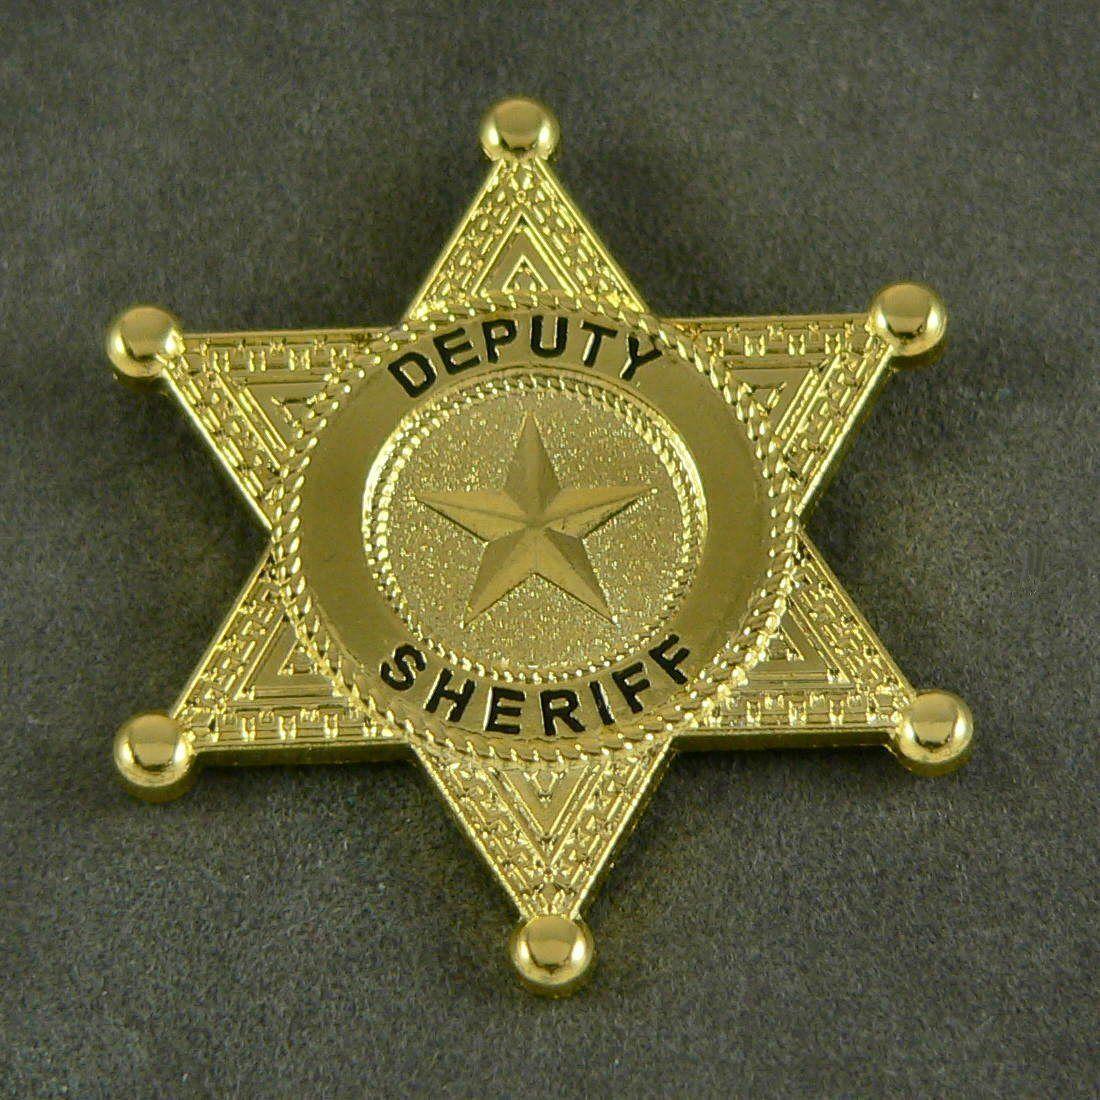 Deputy Sheriff 6 Point Star Mini Badge Lapel Pin Police Badge Badge Mens Wedding Attire